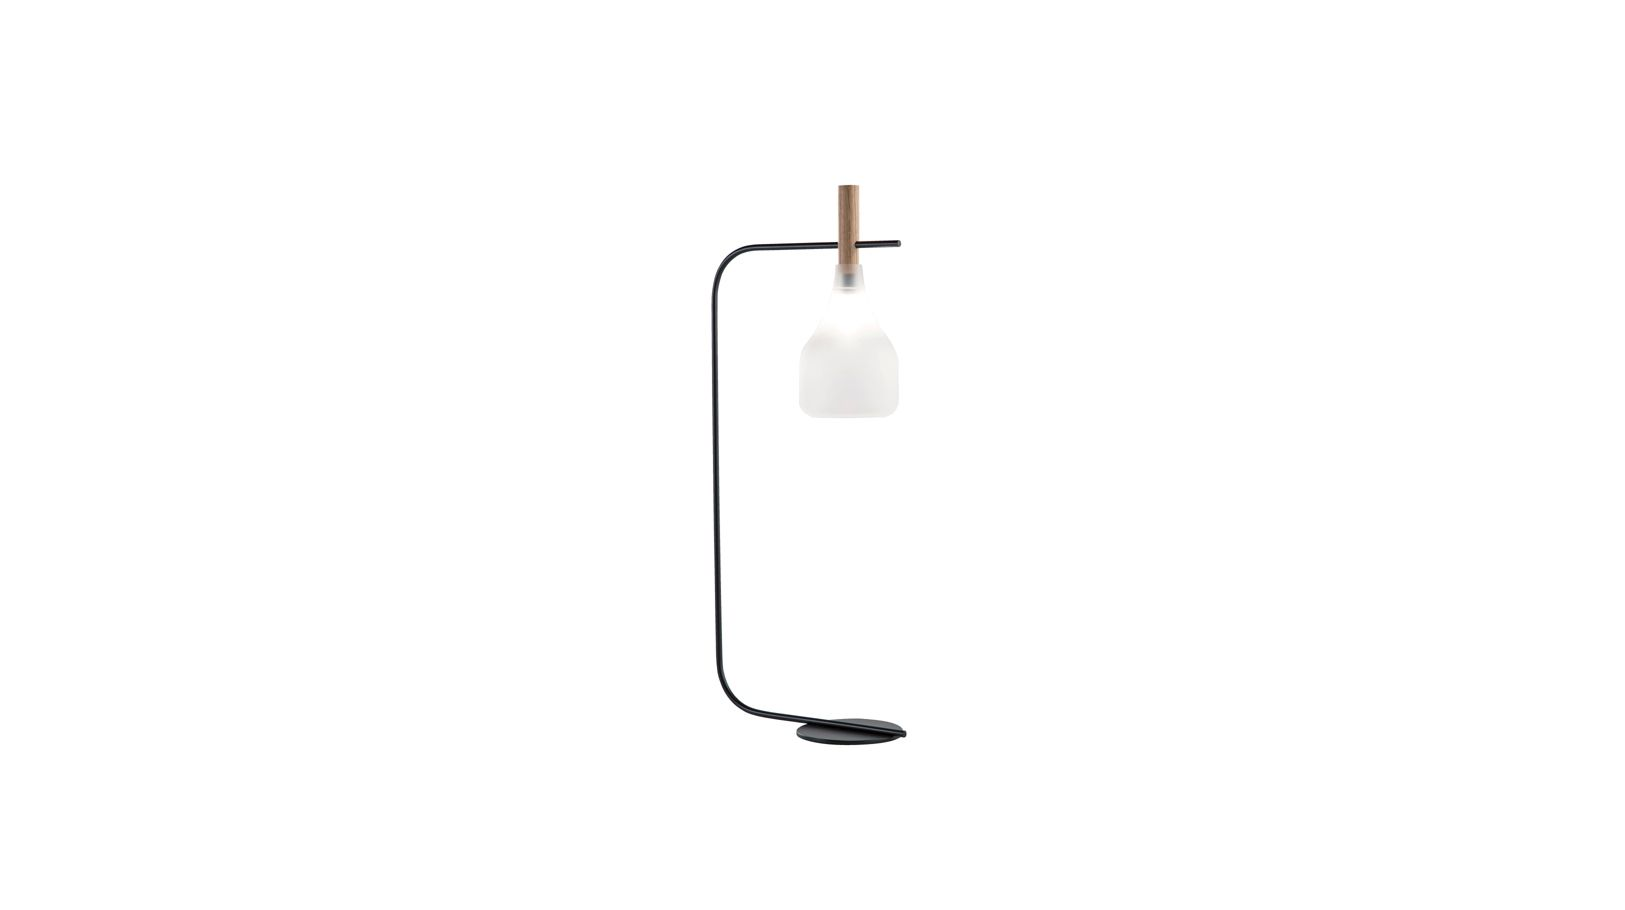 pixl miroir bibliotheque roche bobois. Black Bedroom Furniture Sets. Home Design Ideas